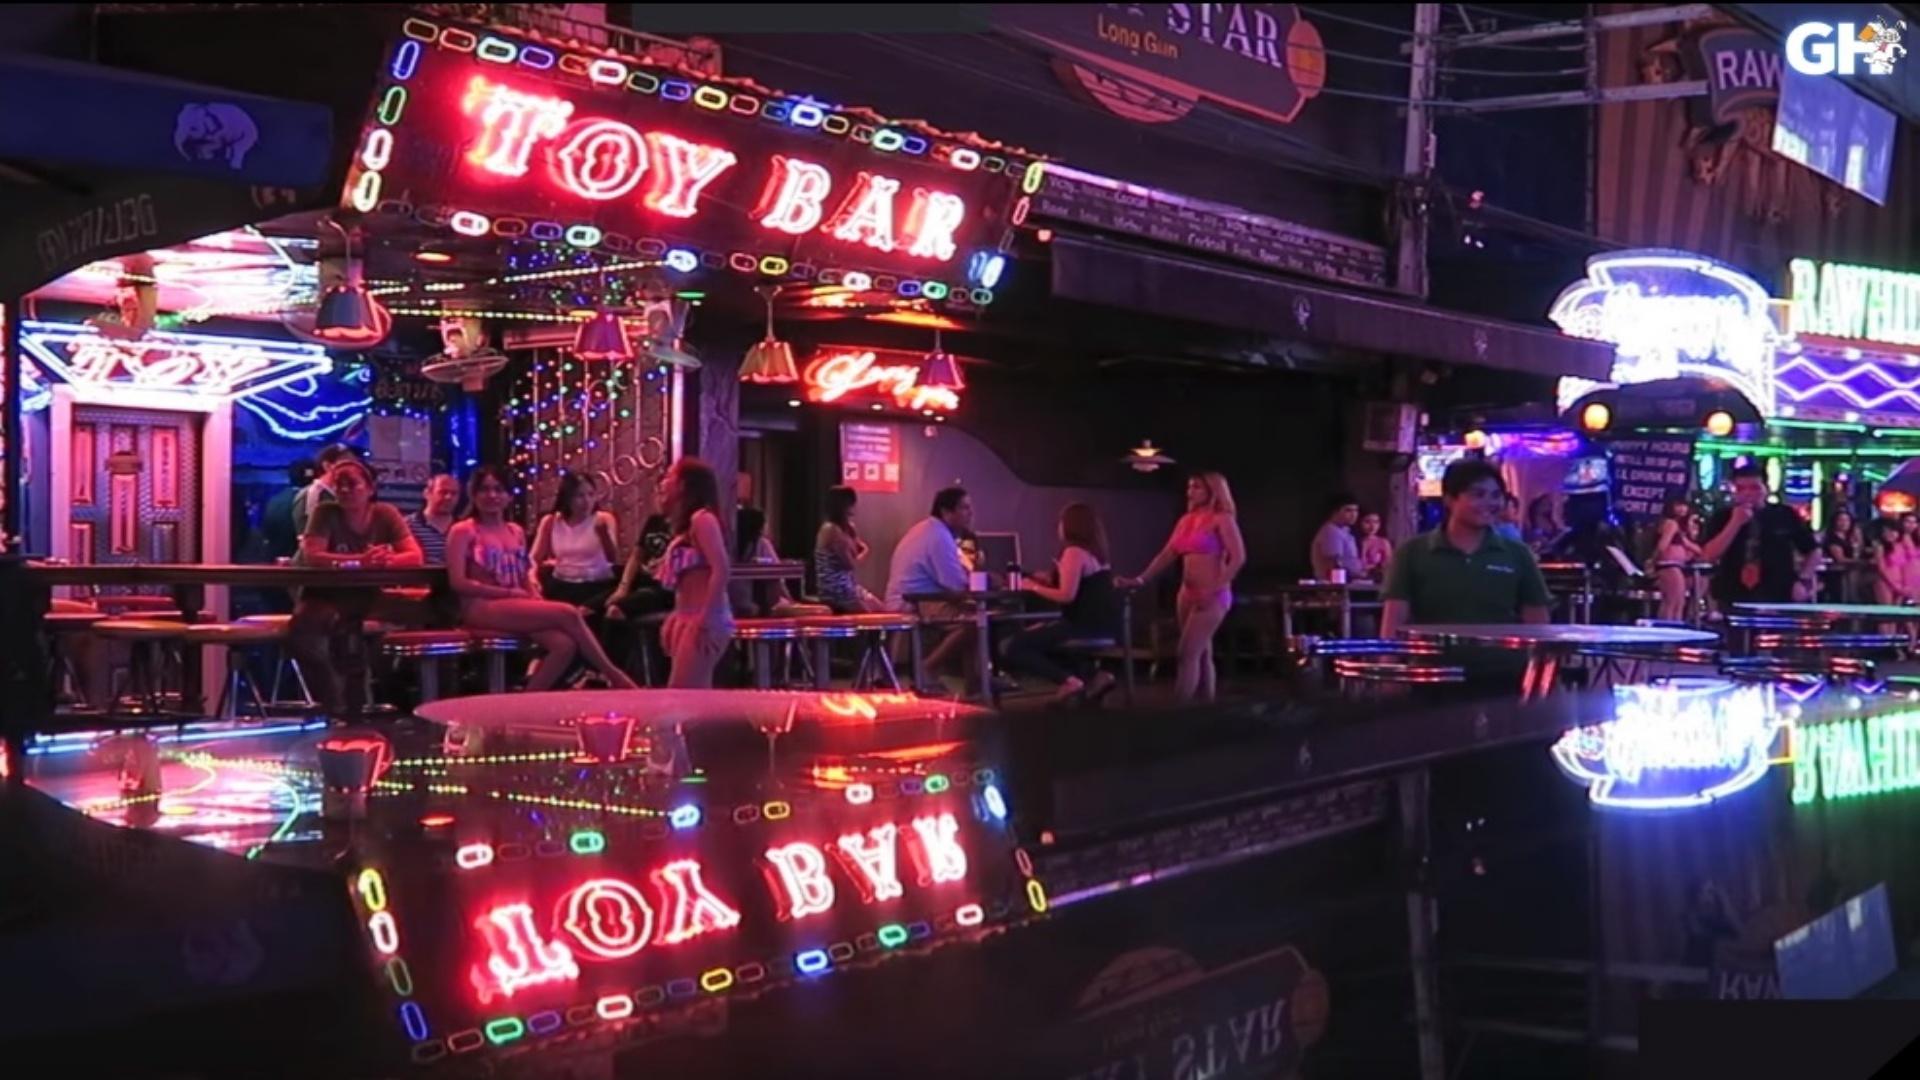 Bar bangkok bj 8 Blowjob